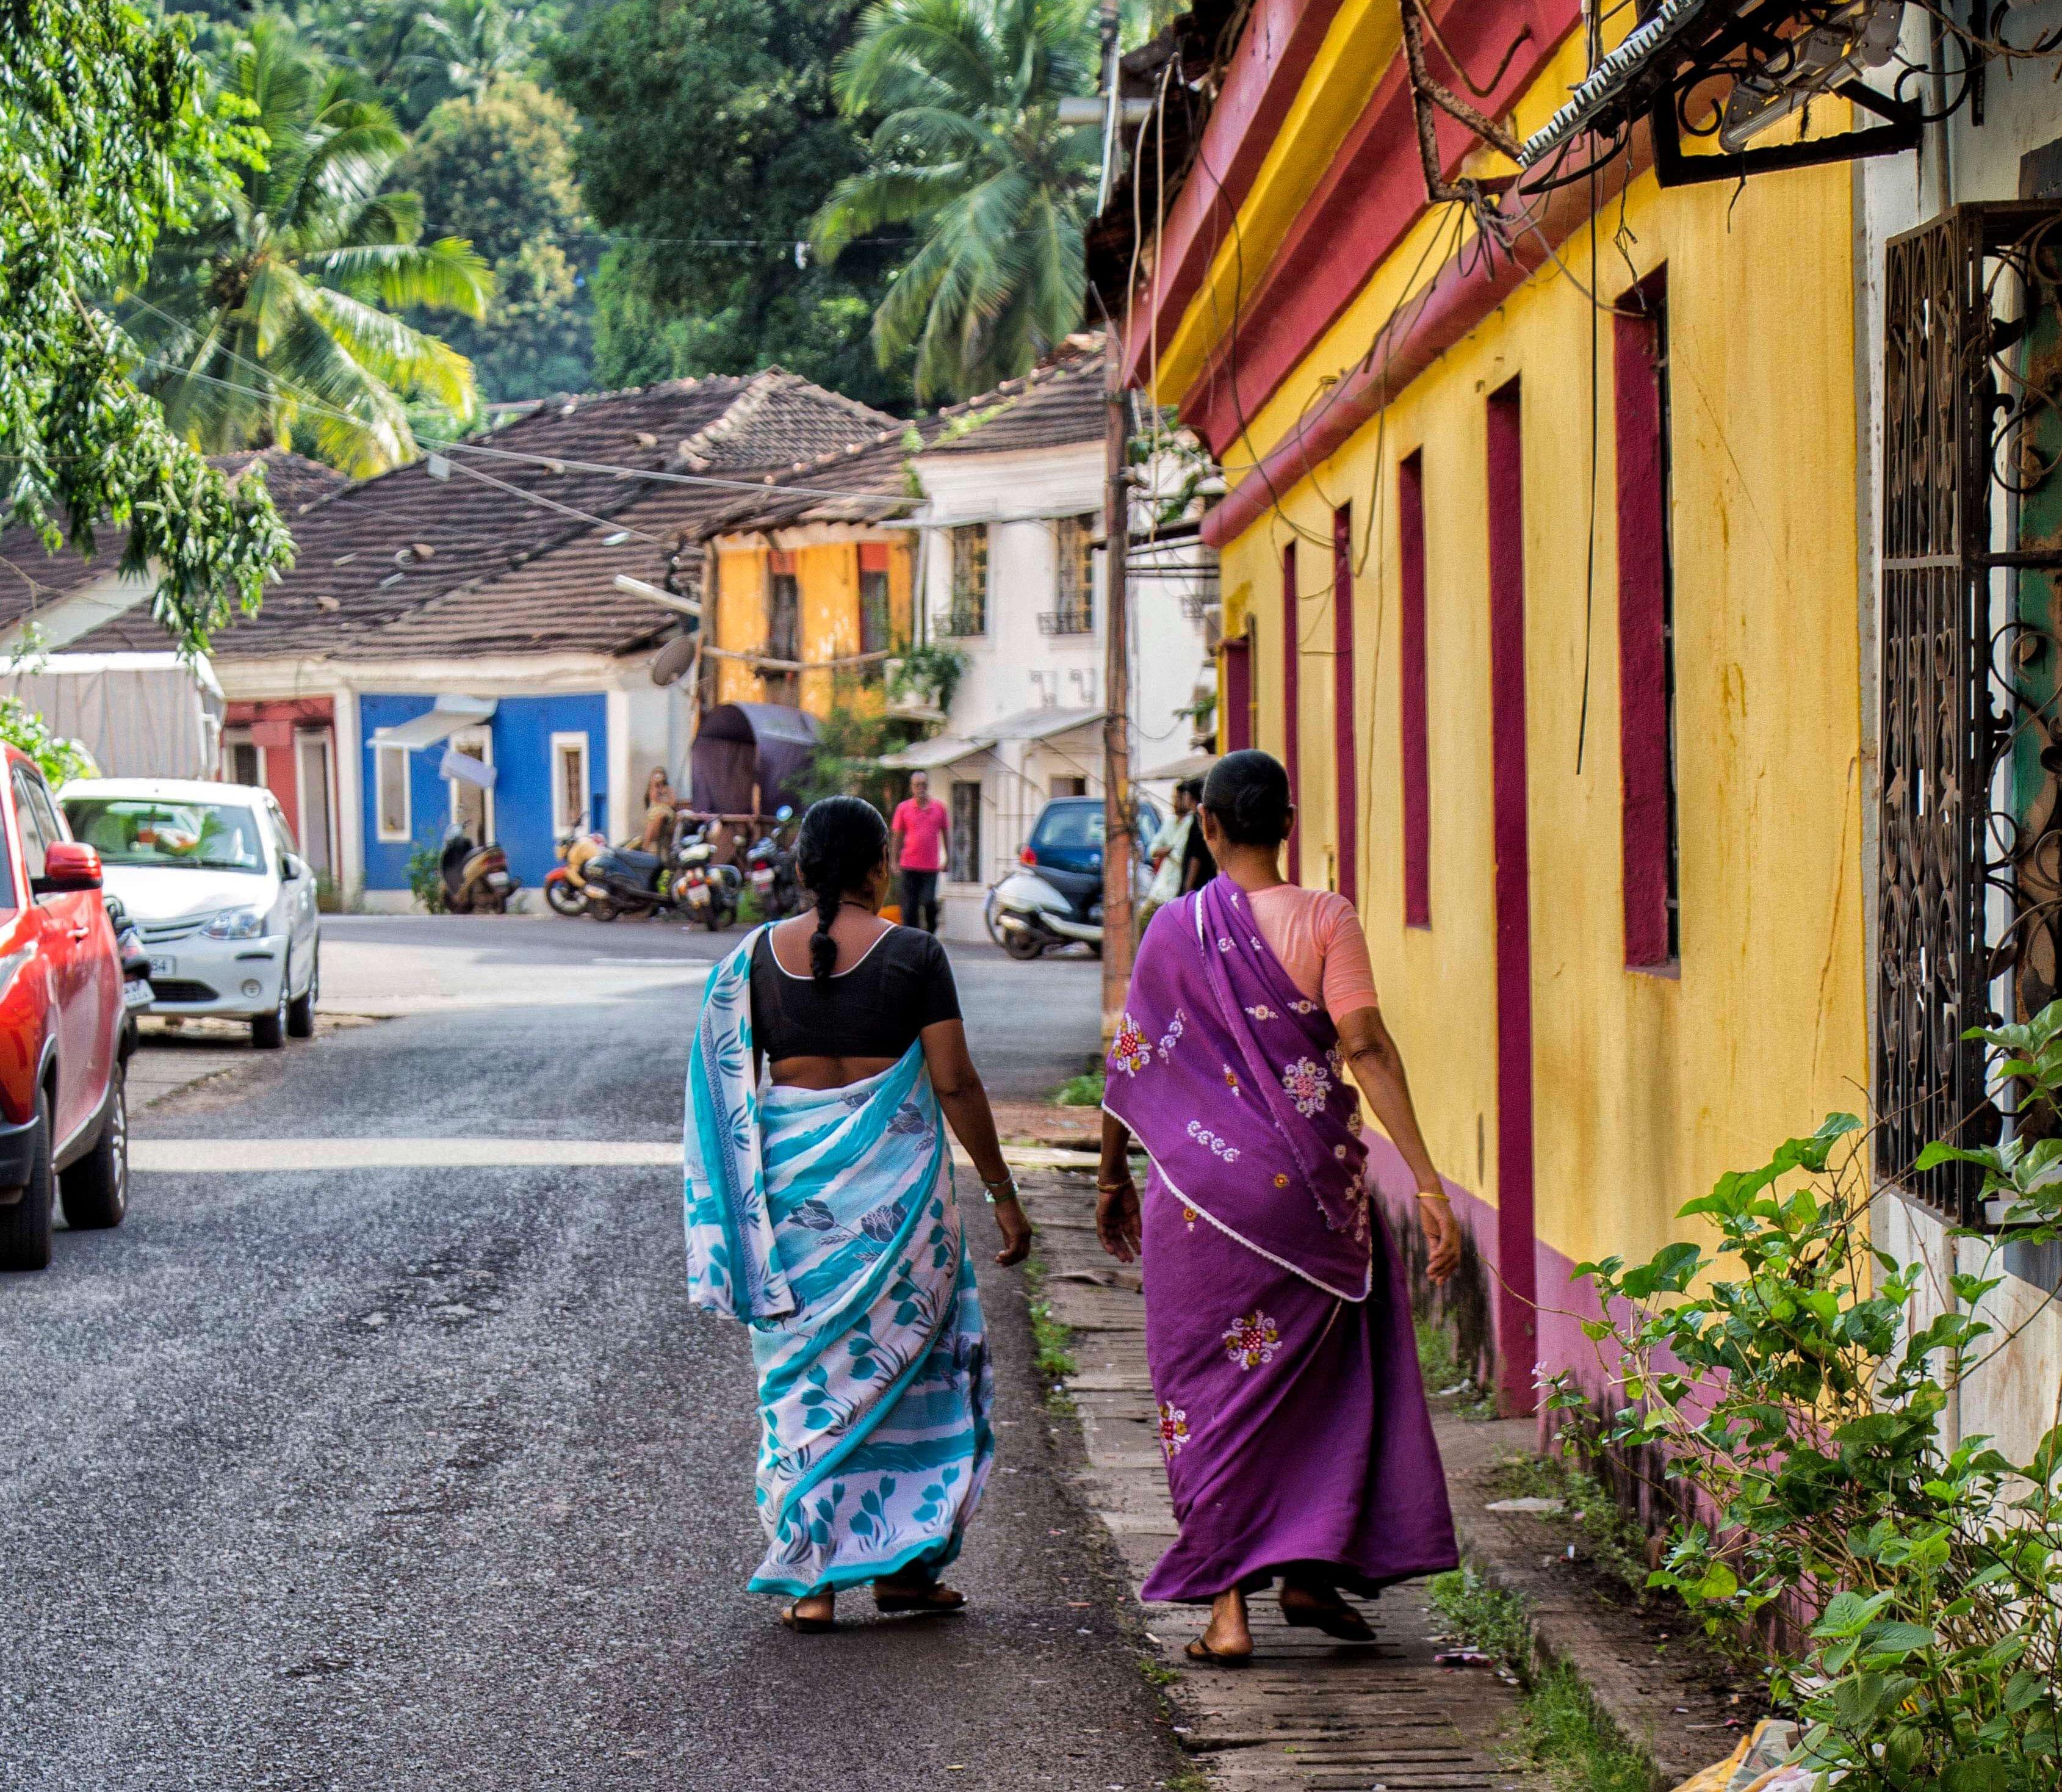 Indian women in saris in Panaji, Goa